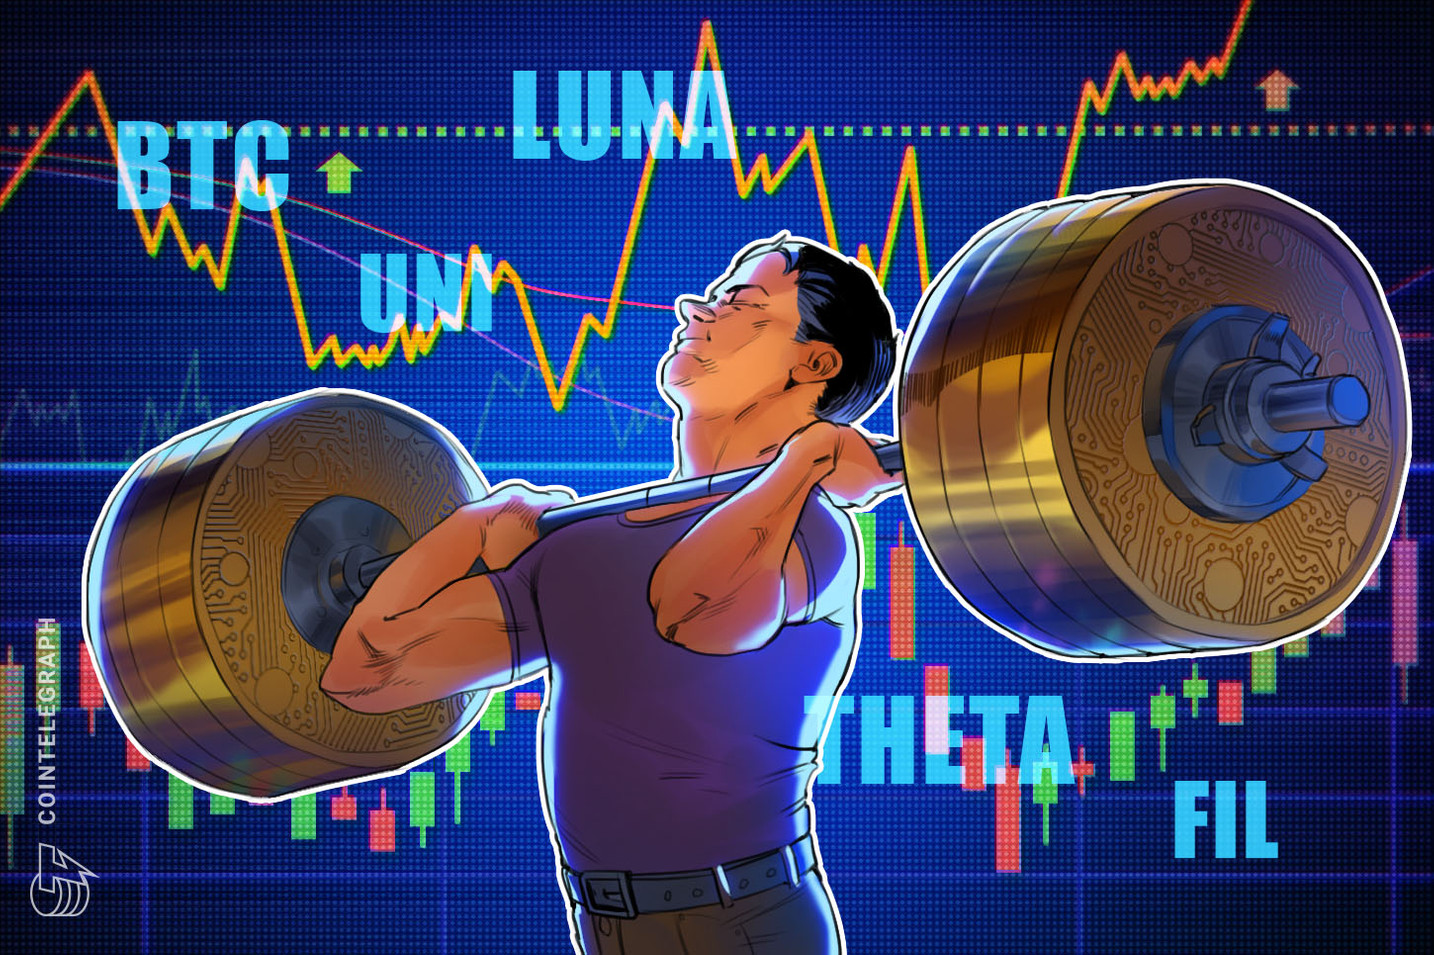 Top 5 cryptocurrencies to watch this week: BTC, UNI, LUNA, THETA, FIL